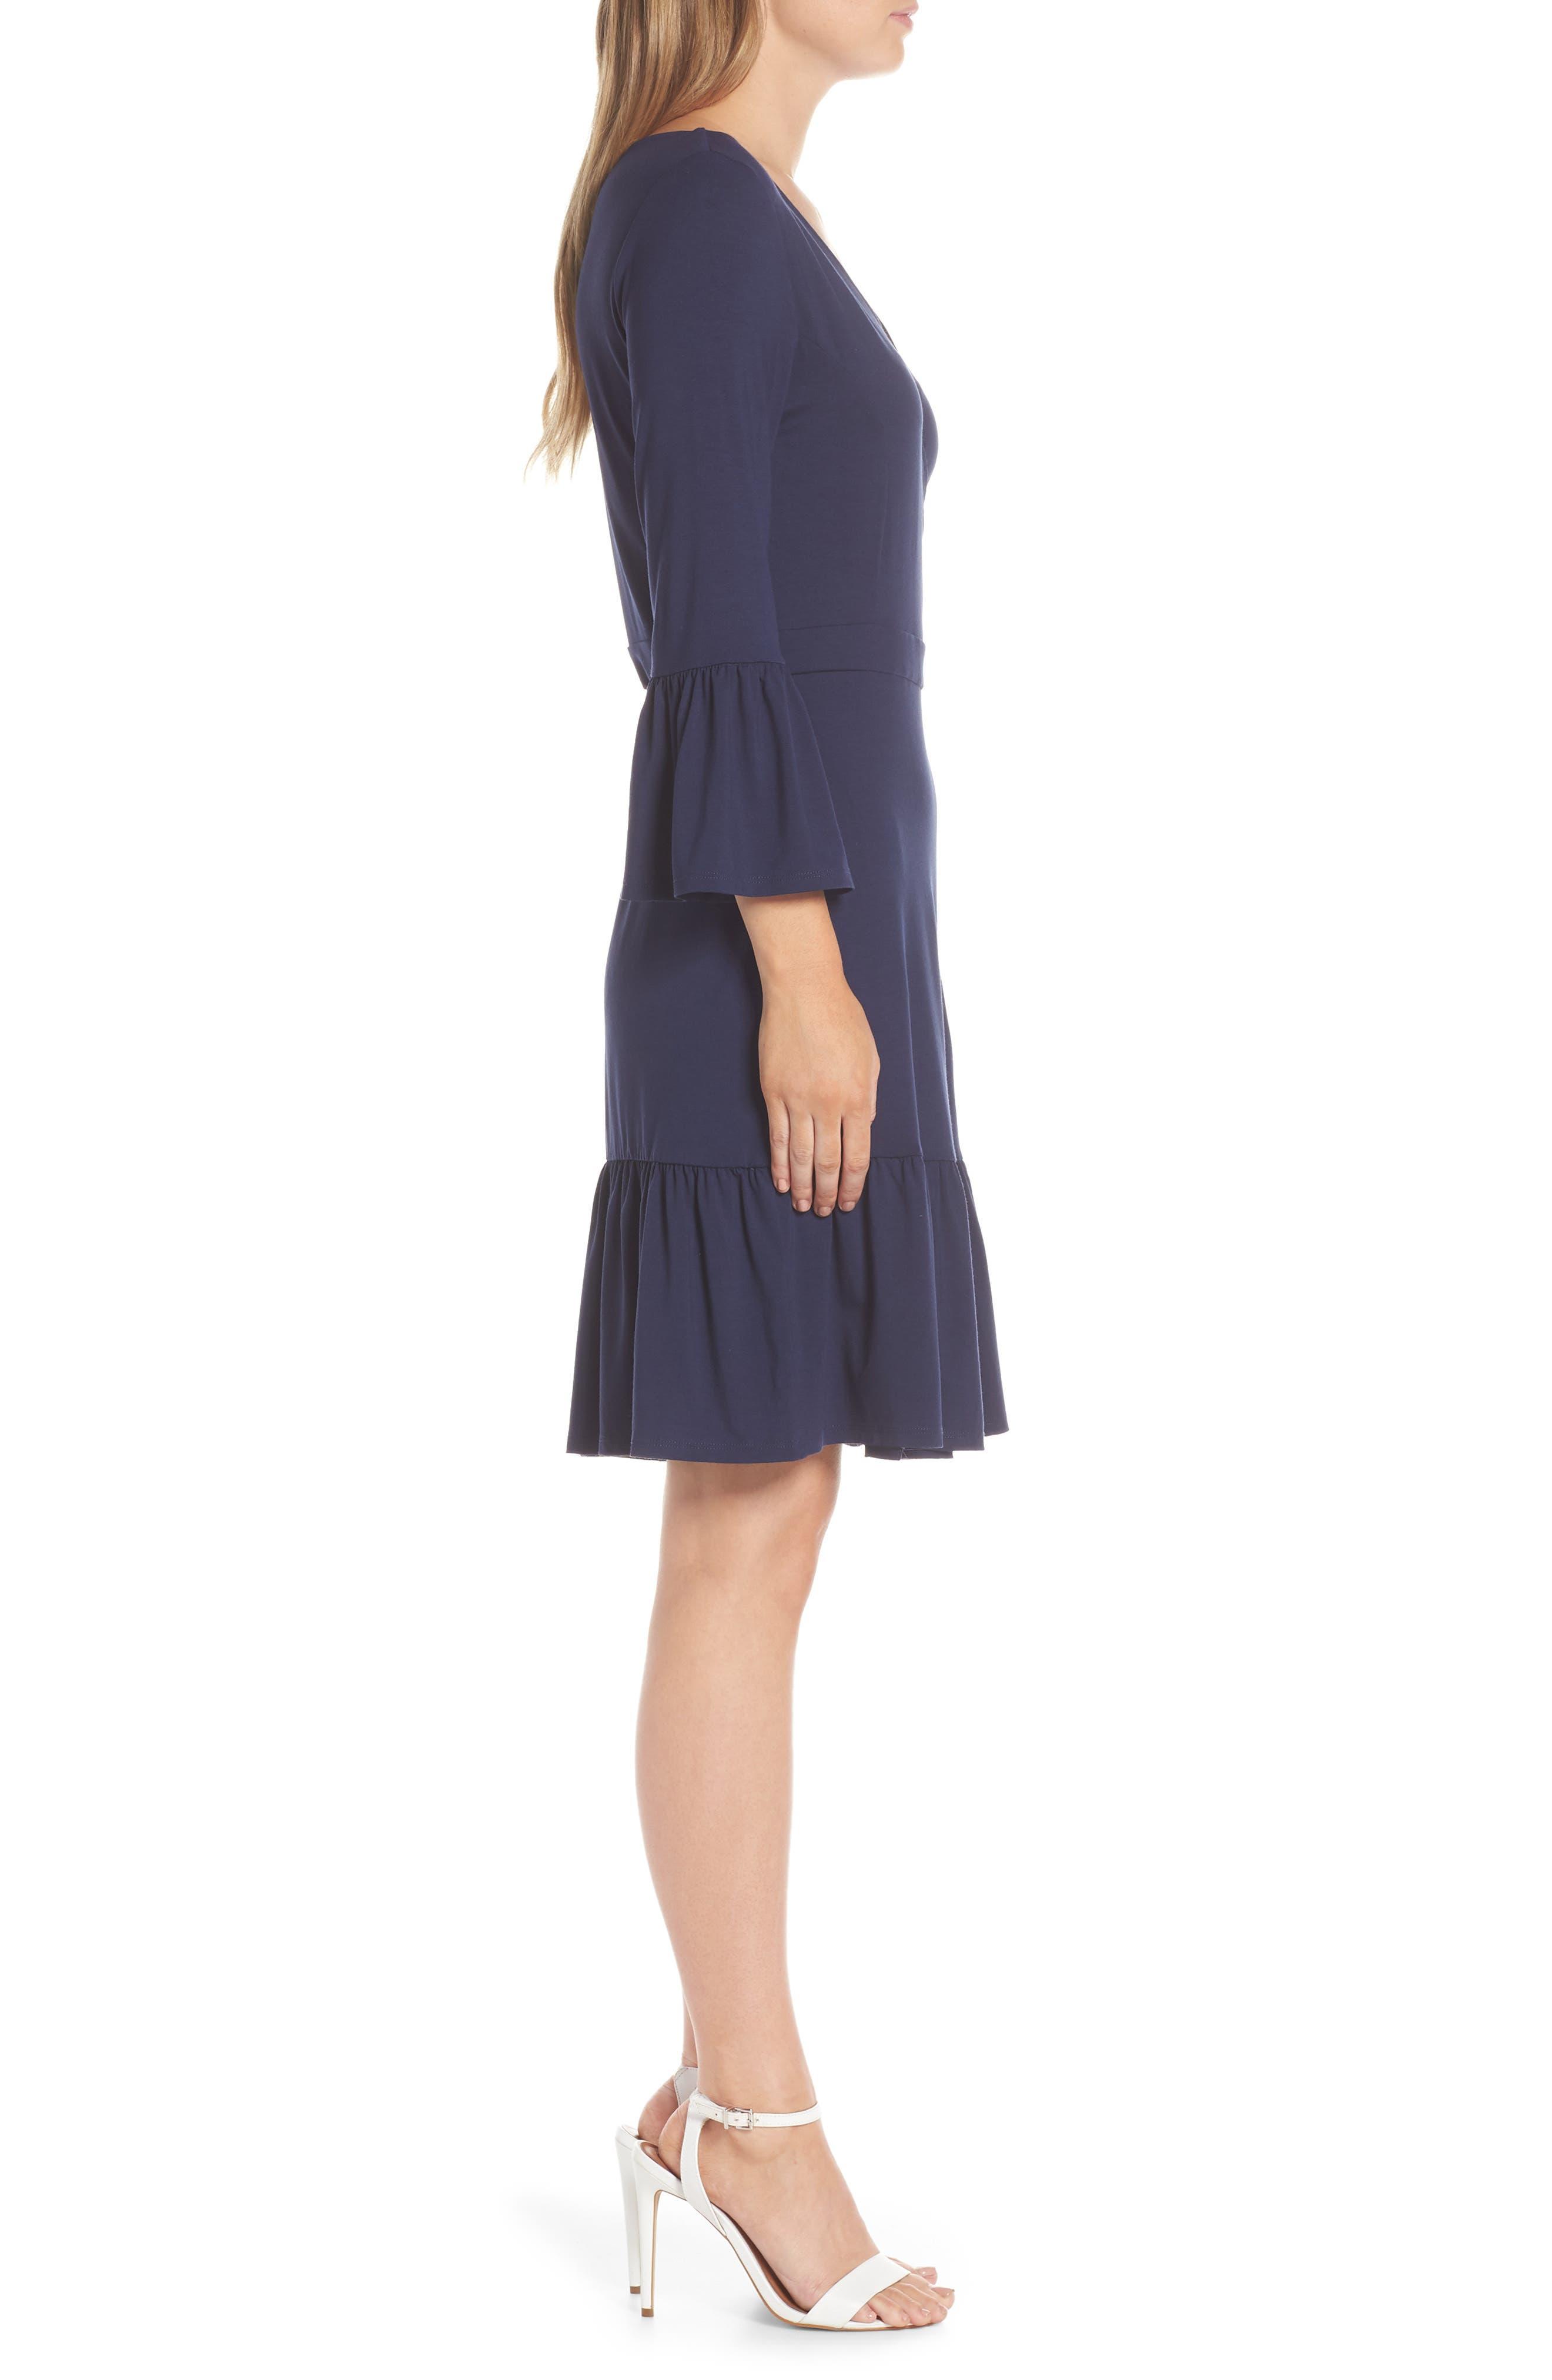 LILLY PULITZER<SUP>®</SUP>, Misha Wrap Dress, Alternate thumbnail 3, color, TRUE NAVY